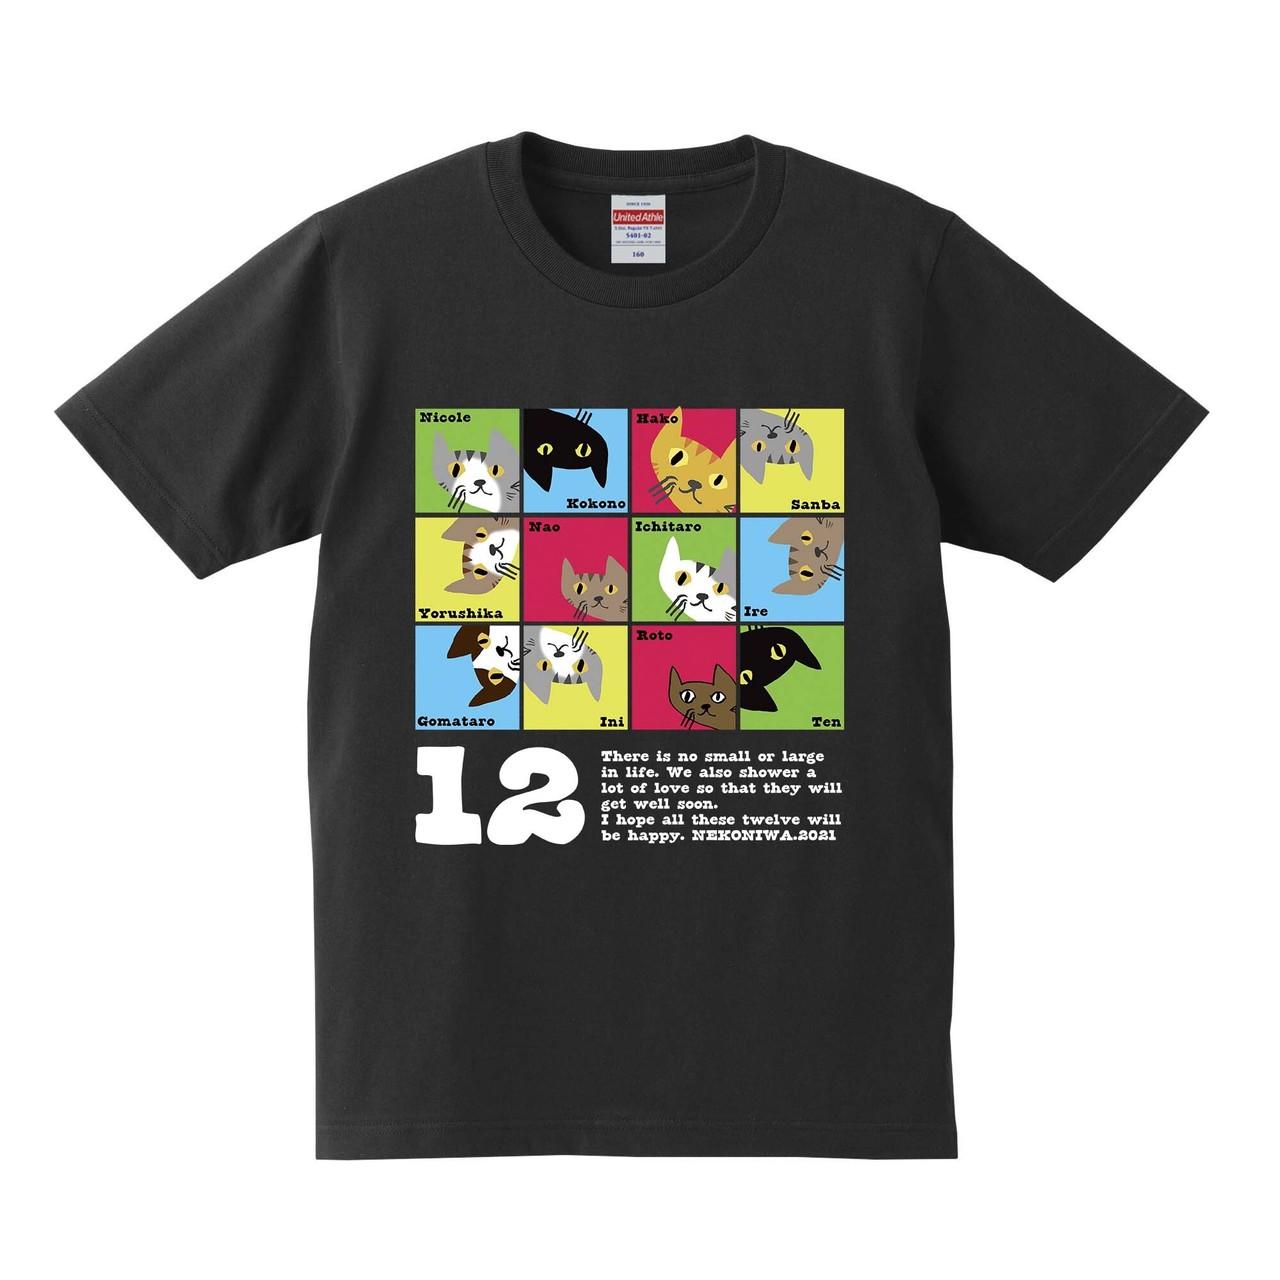 【NEW】キッズサイズNEKONIWA12Tシャツ 1,980円 ≪全国送料無料≫